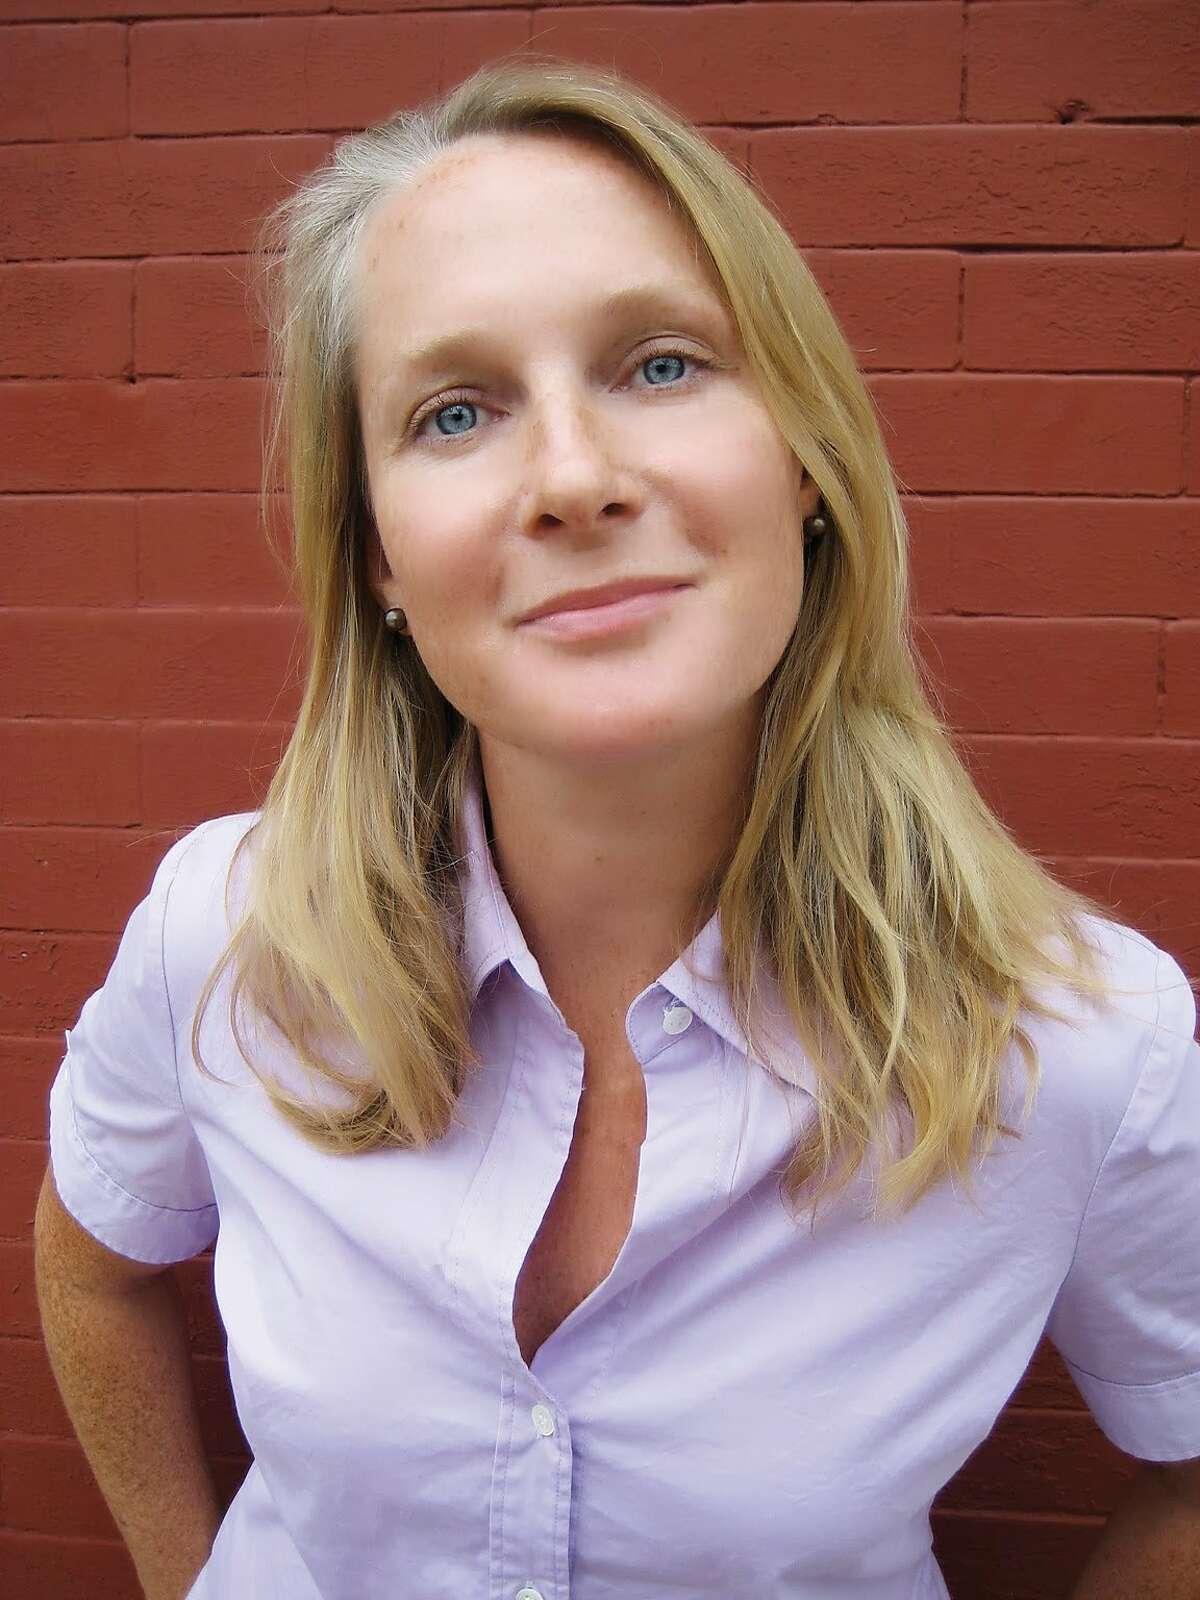 Piper Kerman, author of Orange is the New Black